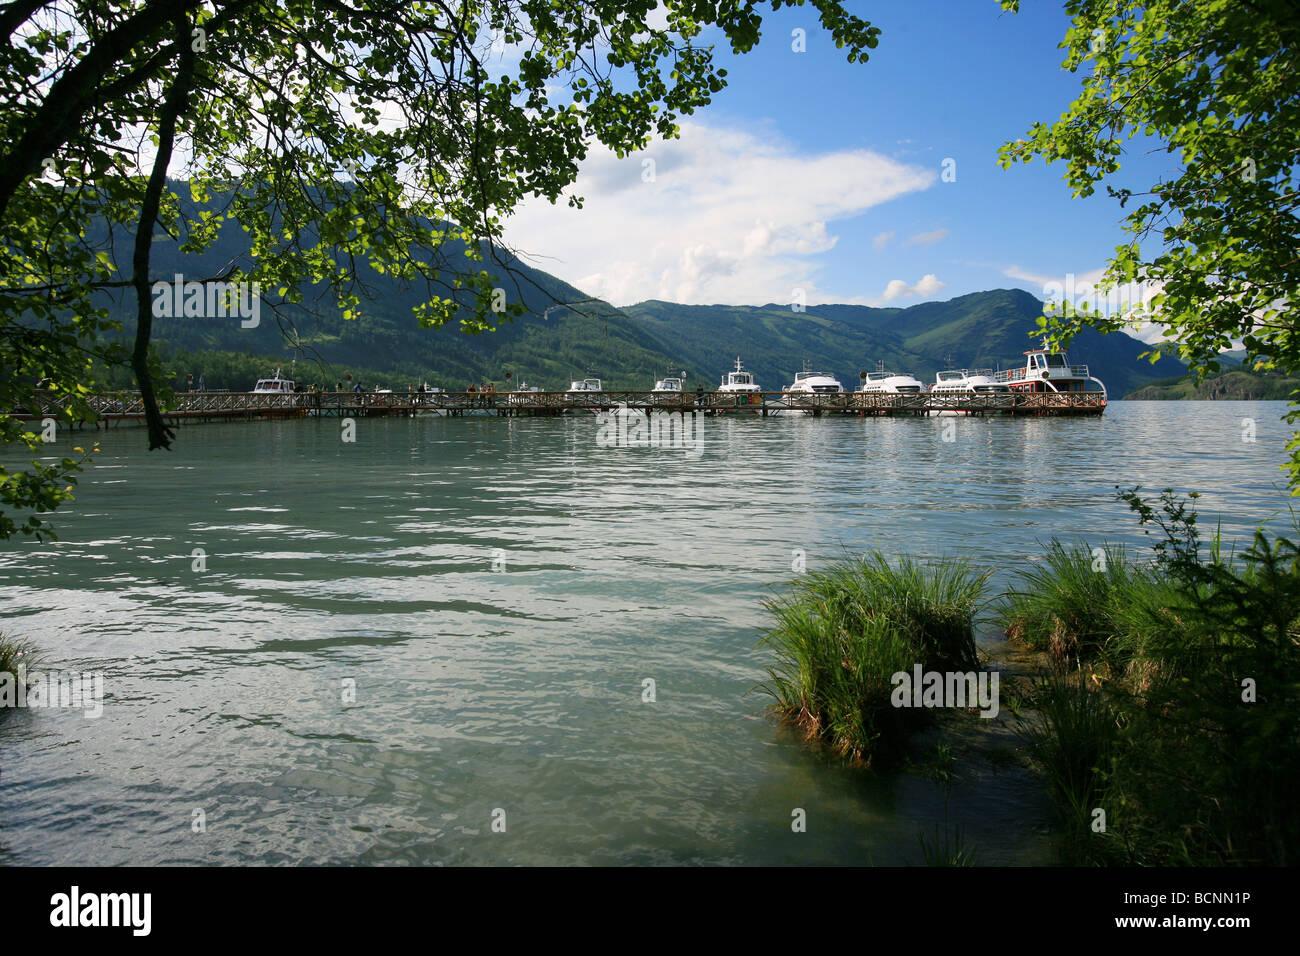 Tour boats waiting at the pier, Kanas Lake, Xinjiang Uyghur Autonomous Region, China Stock Photo